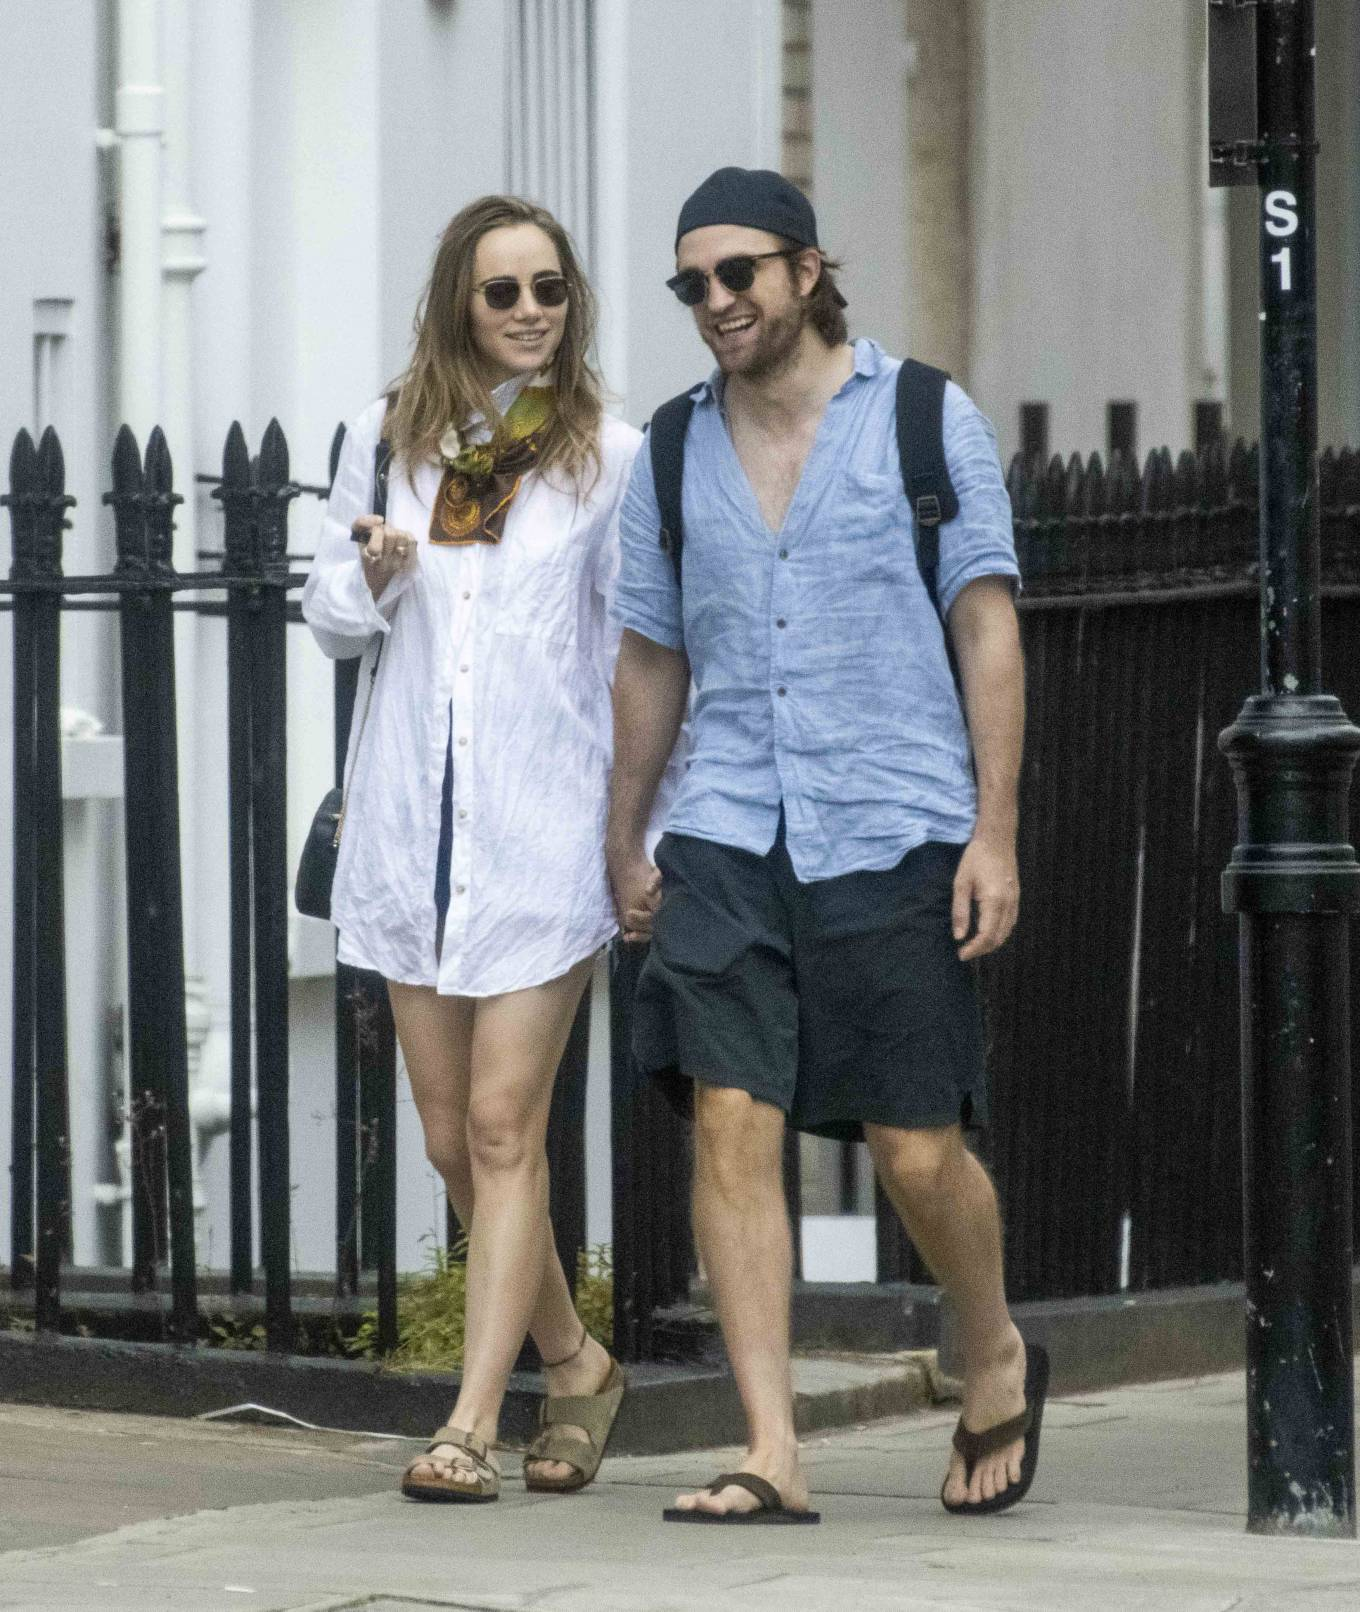 Suki Waterhouse 2020 : Suki Waterhouse and Robert Pattinson – Out in London-26